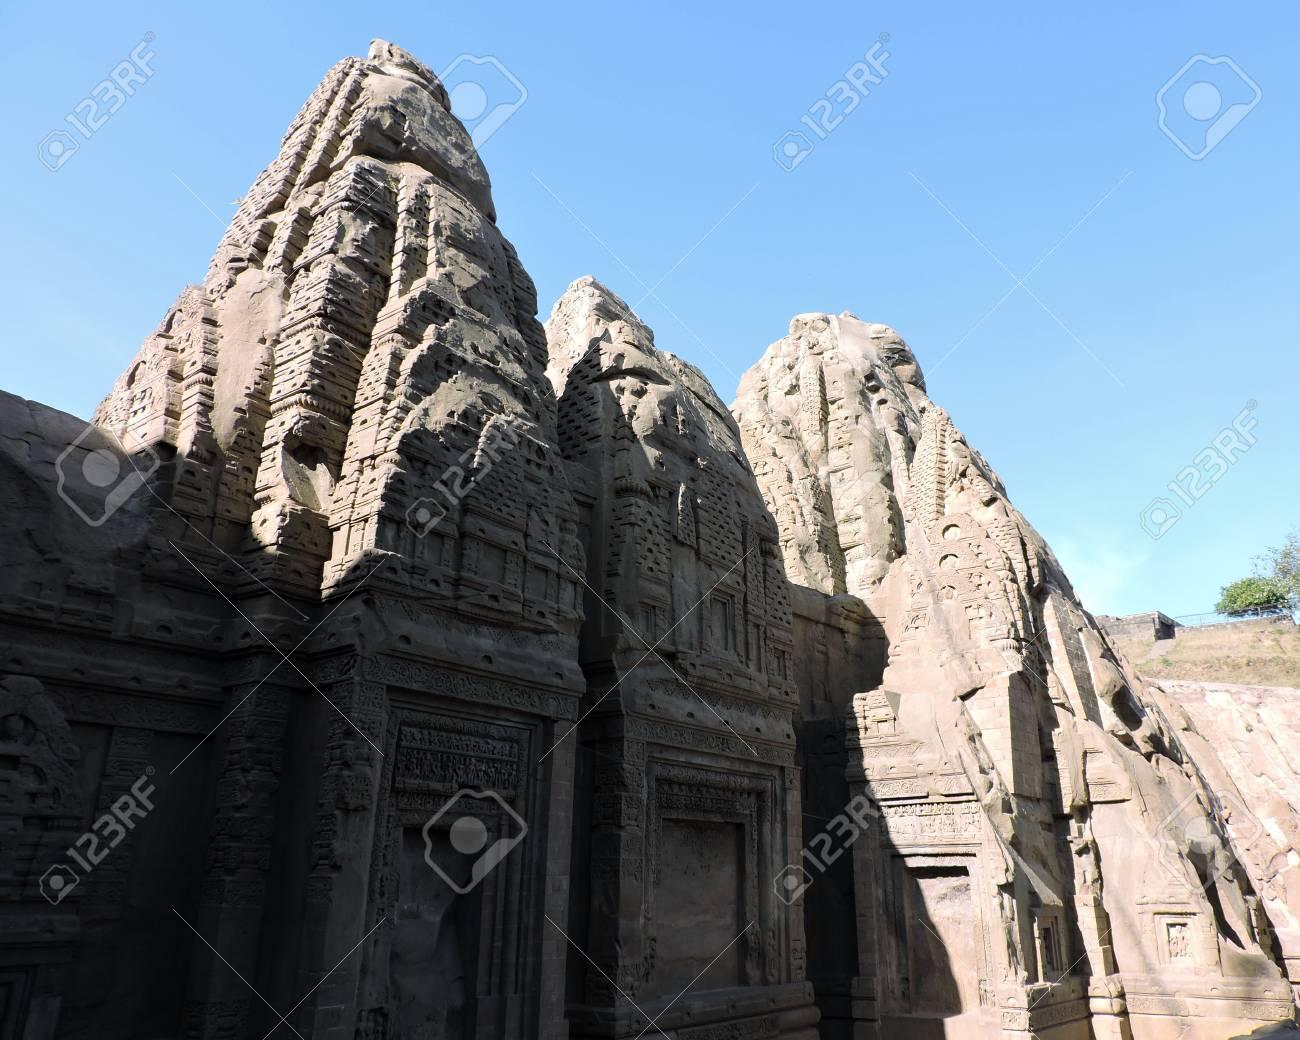 India Architecture Masroor Rock Cut Temple Stock Photo - 50491682